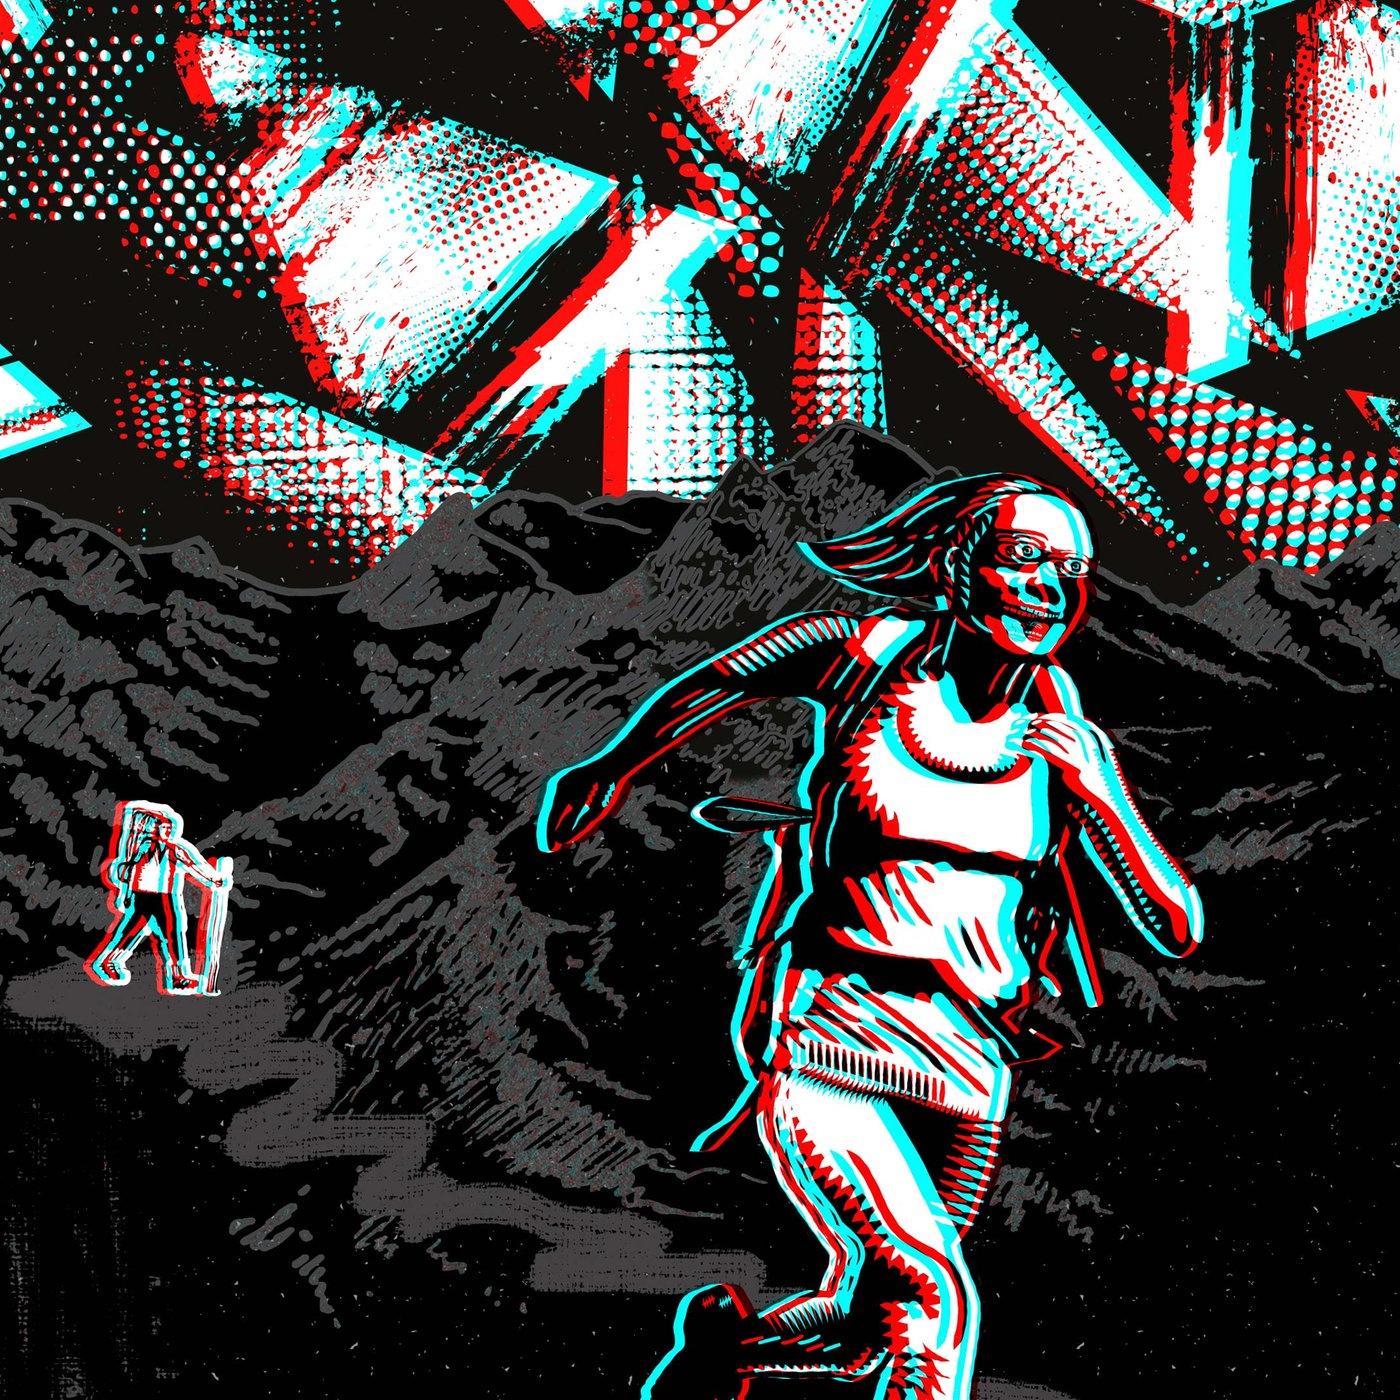 Grande Randonnée - Maries Perspektive im 3D-Sound